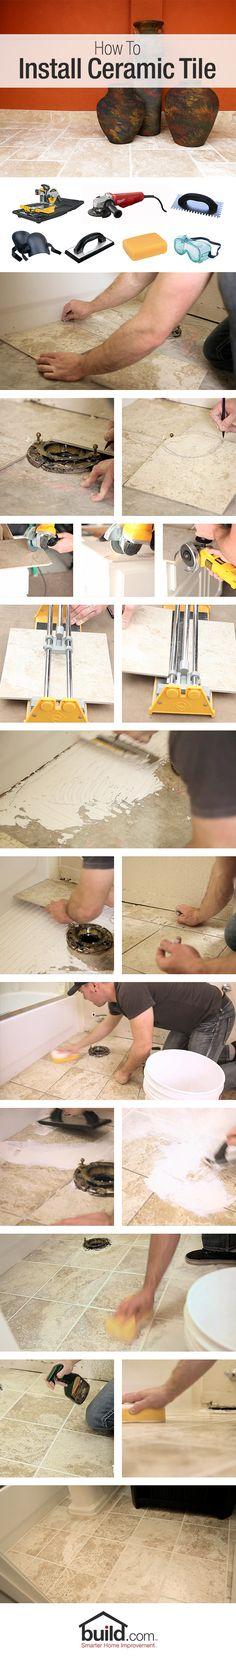 Ceramic Floor Tile Ceramic Floor Tile Installation Instructions